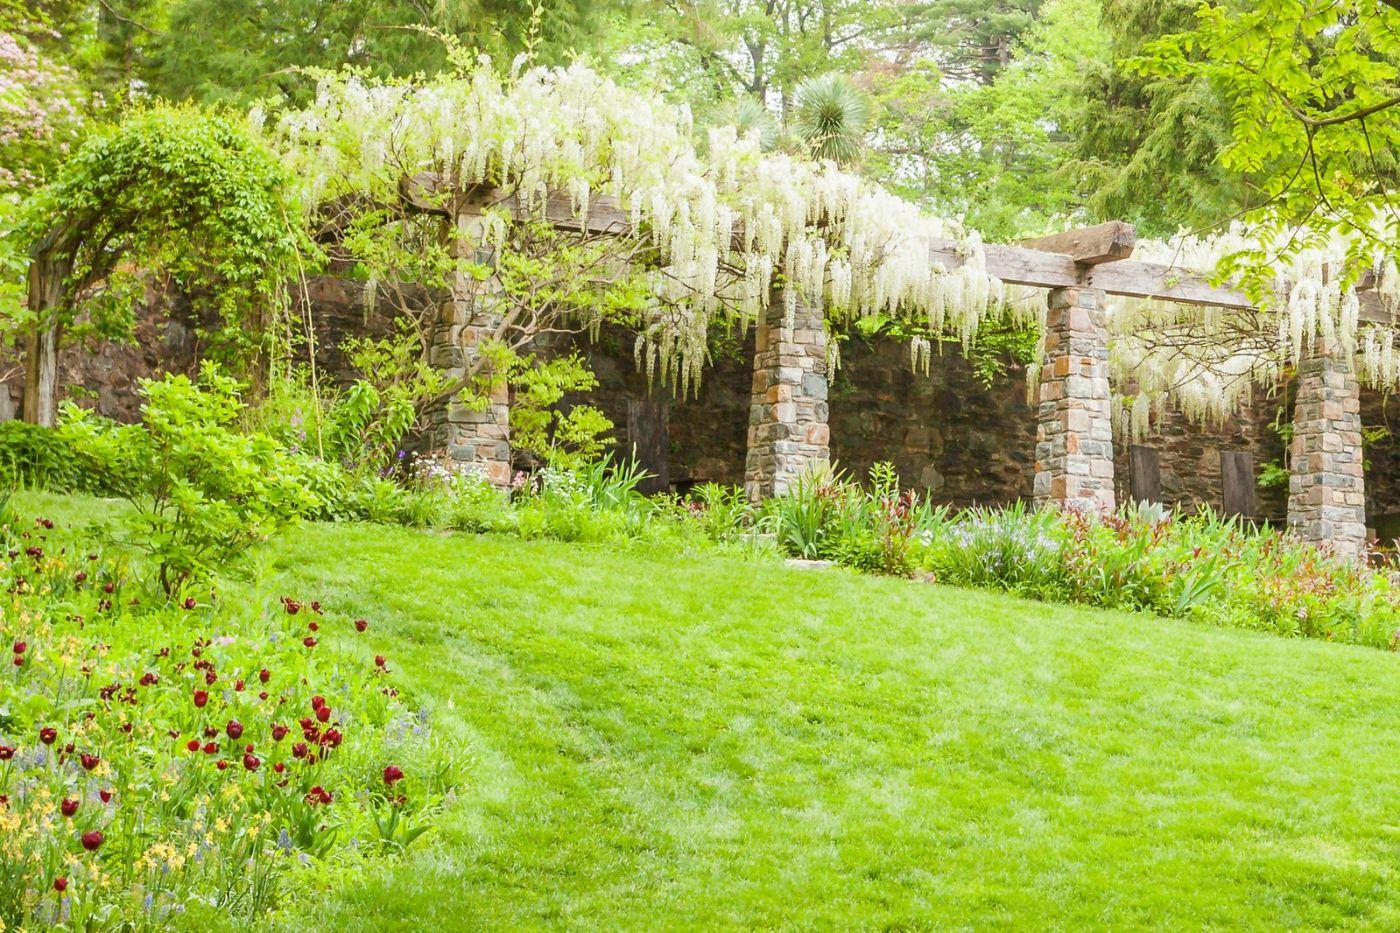 Chanticleer花园,那年盛开的紫藤花_图1-14